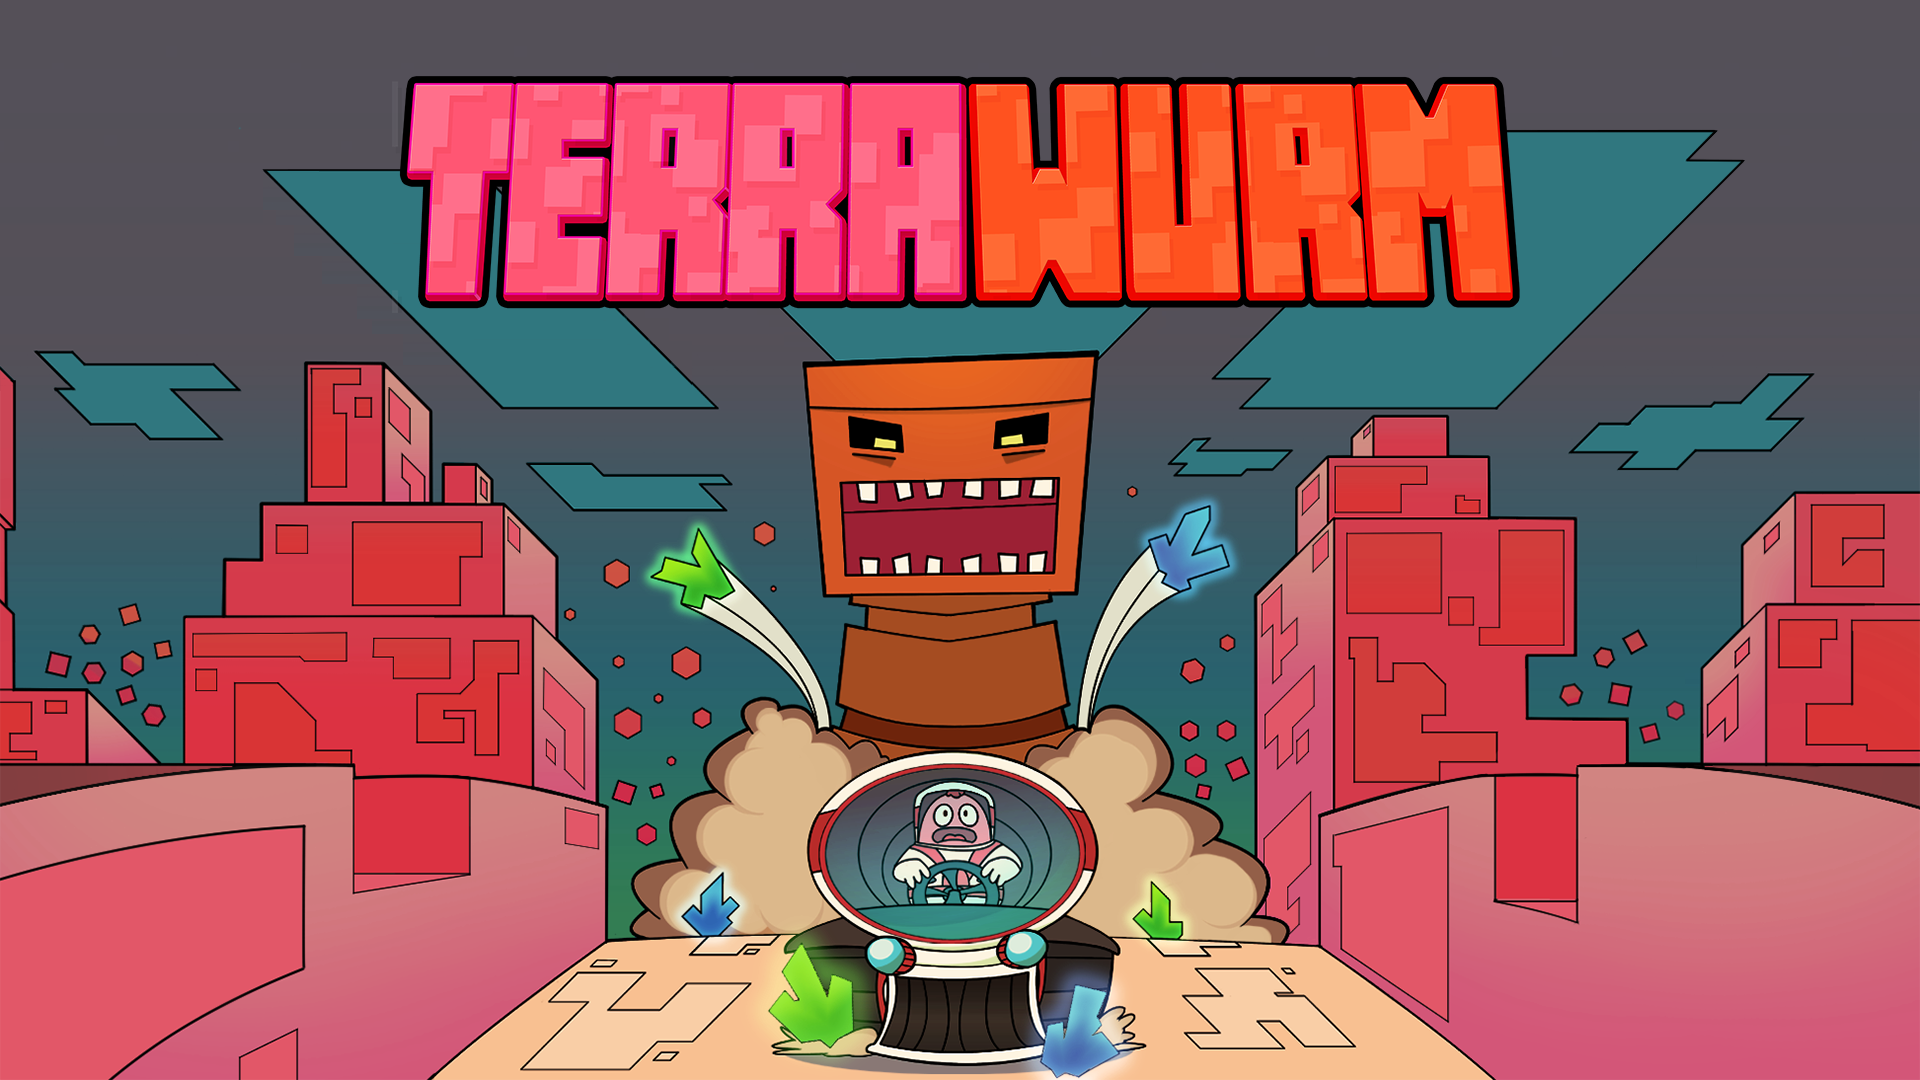 Terrawurm indie game preview